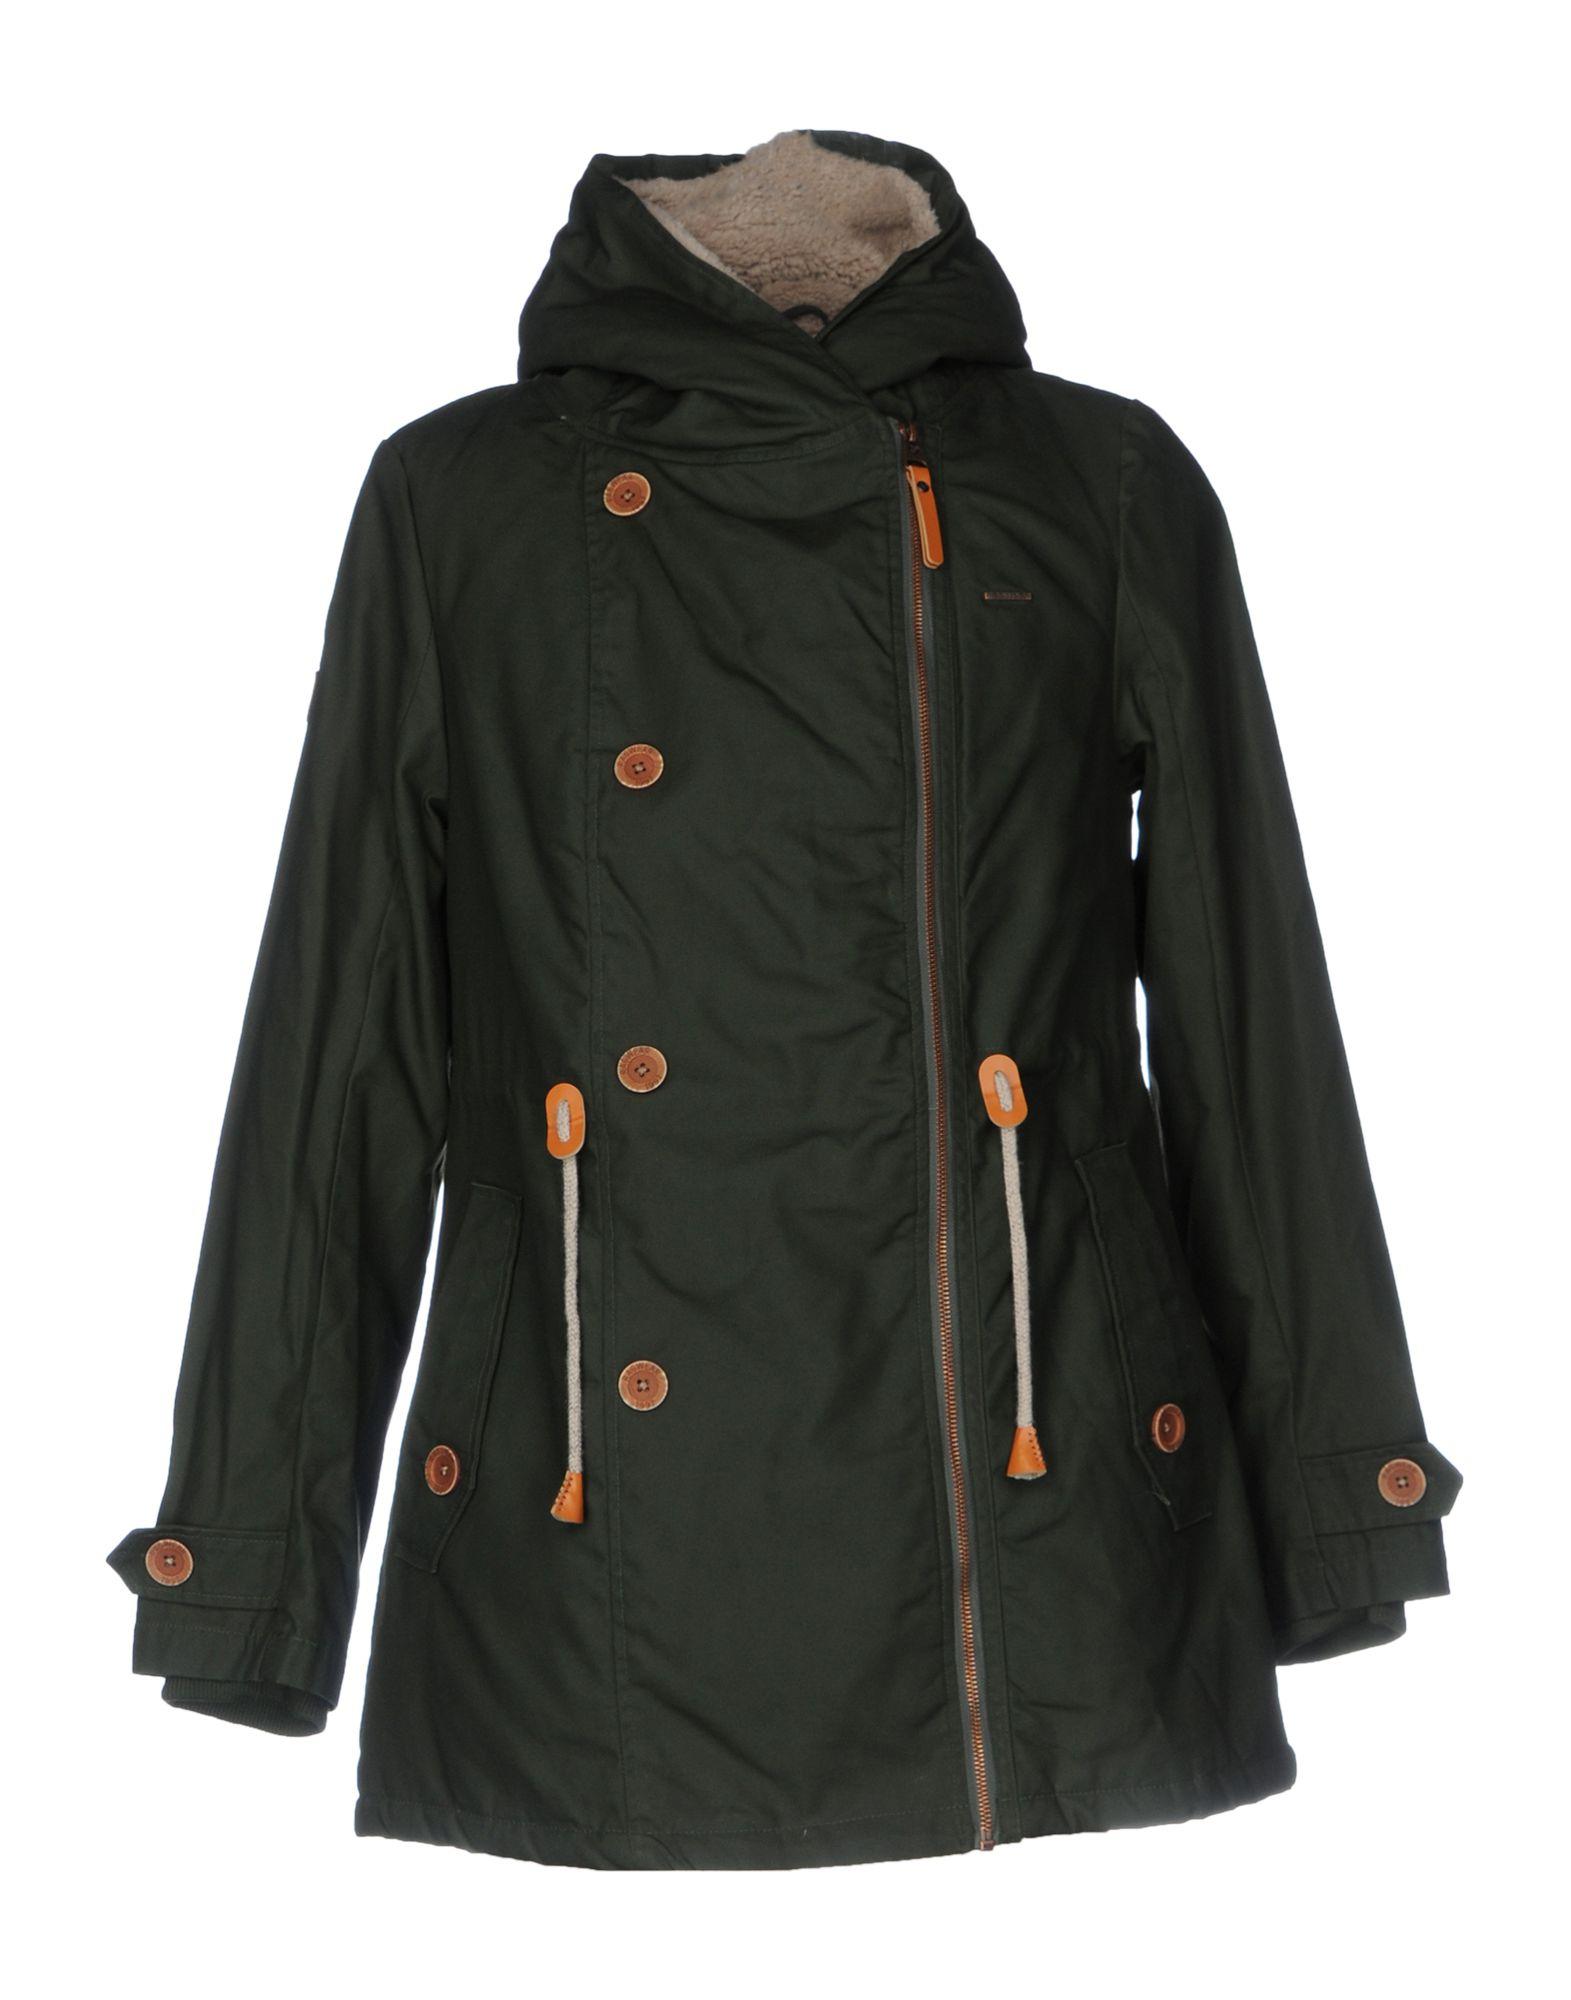 RAGWEAR Herren Jacke Farbe Militärgrün Größe 7